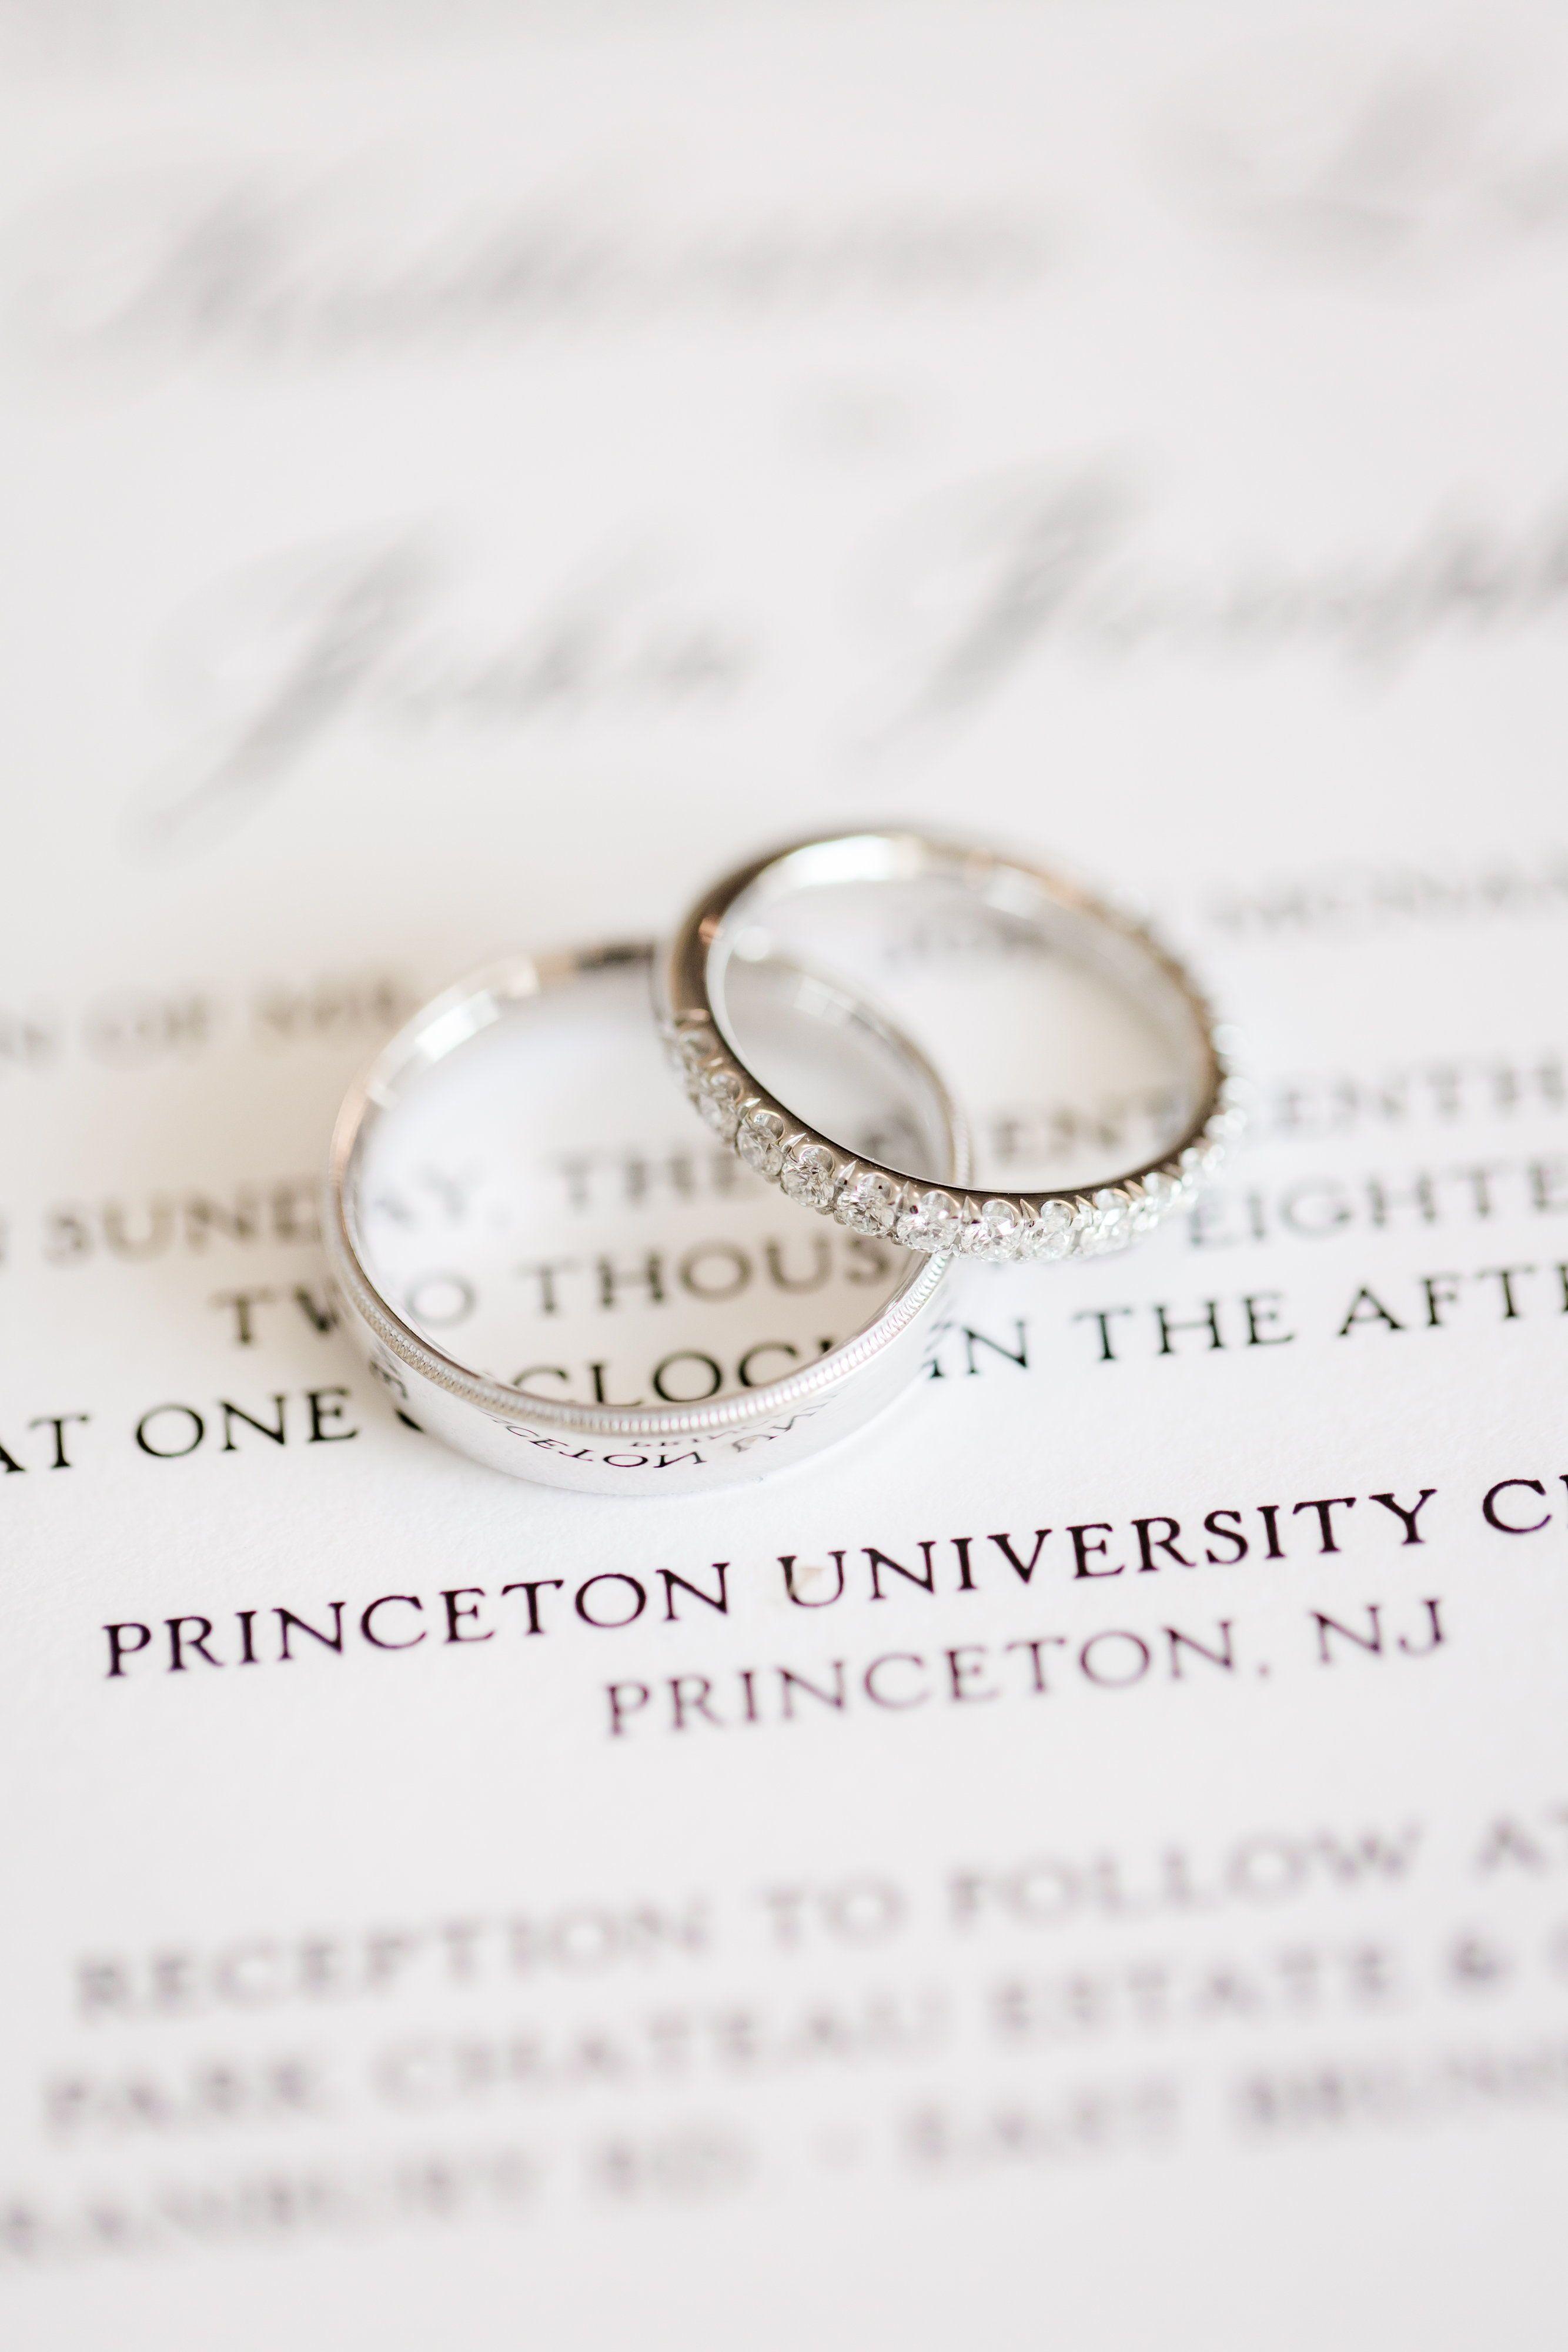 Princeton University Chapel Simple Wedding Bands Summer Wedding Invitations Wedding Bands